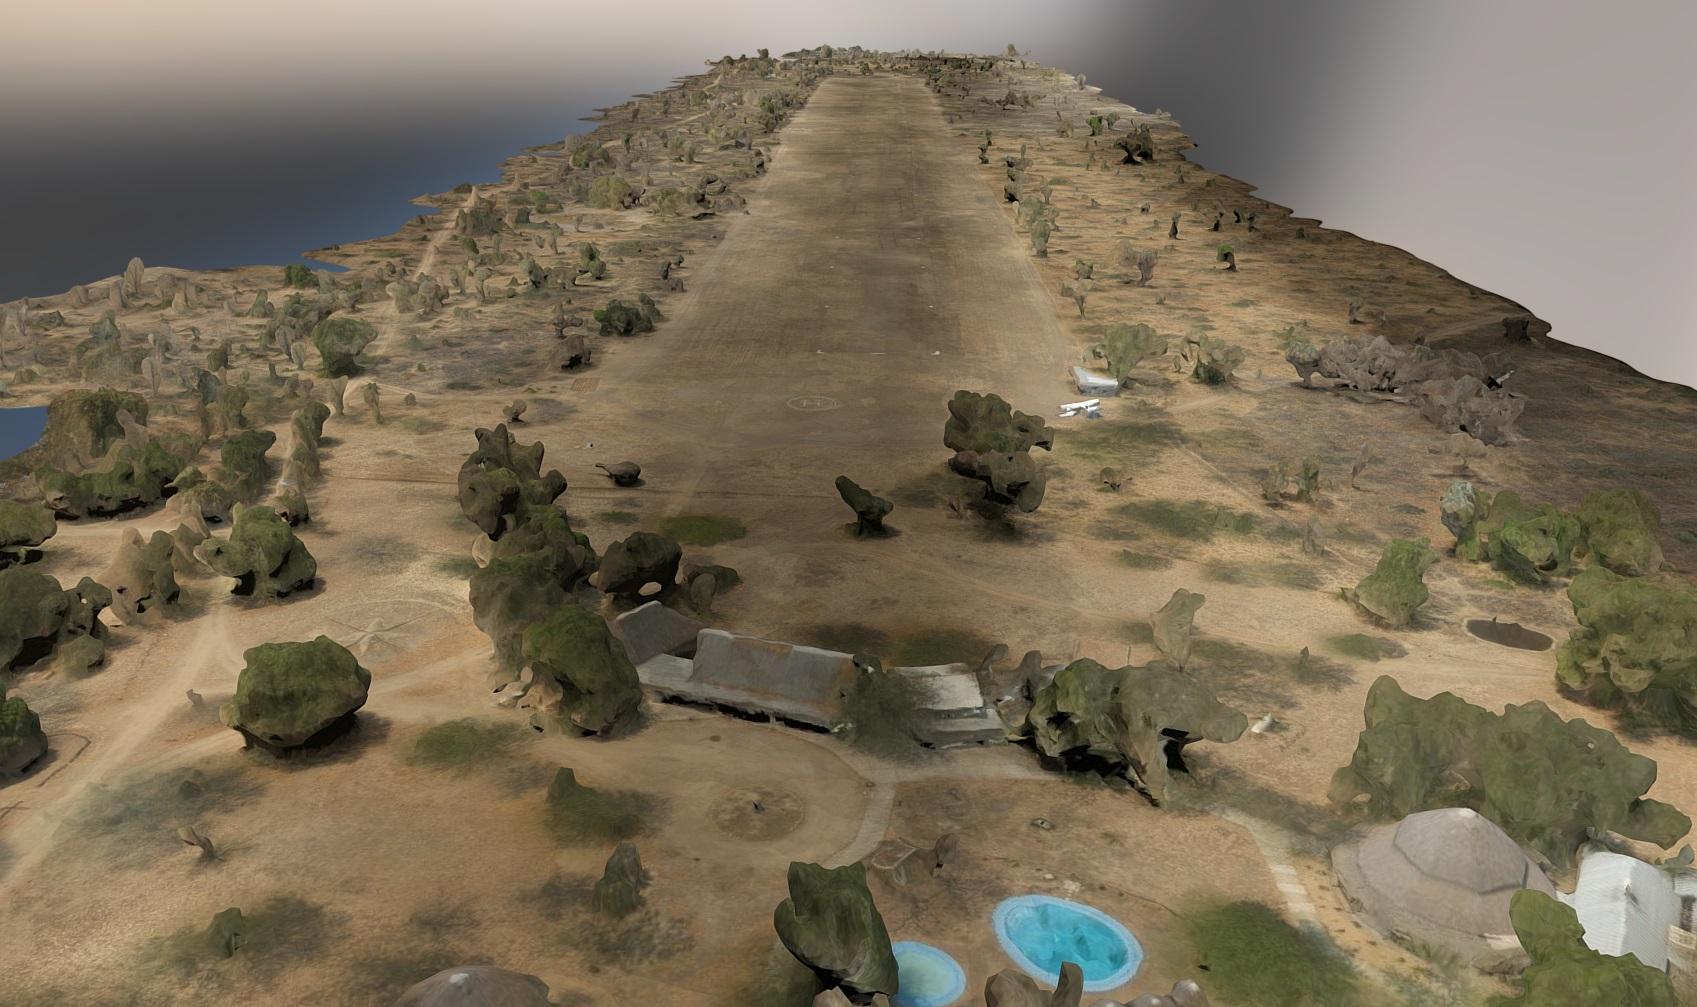 3d render of Chitengo airstrip